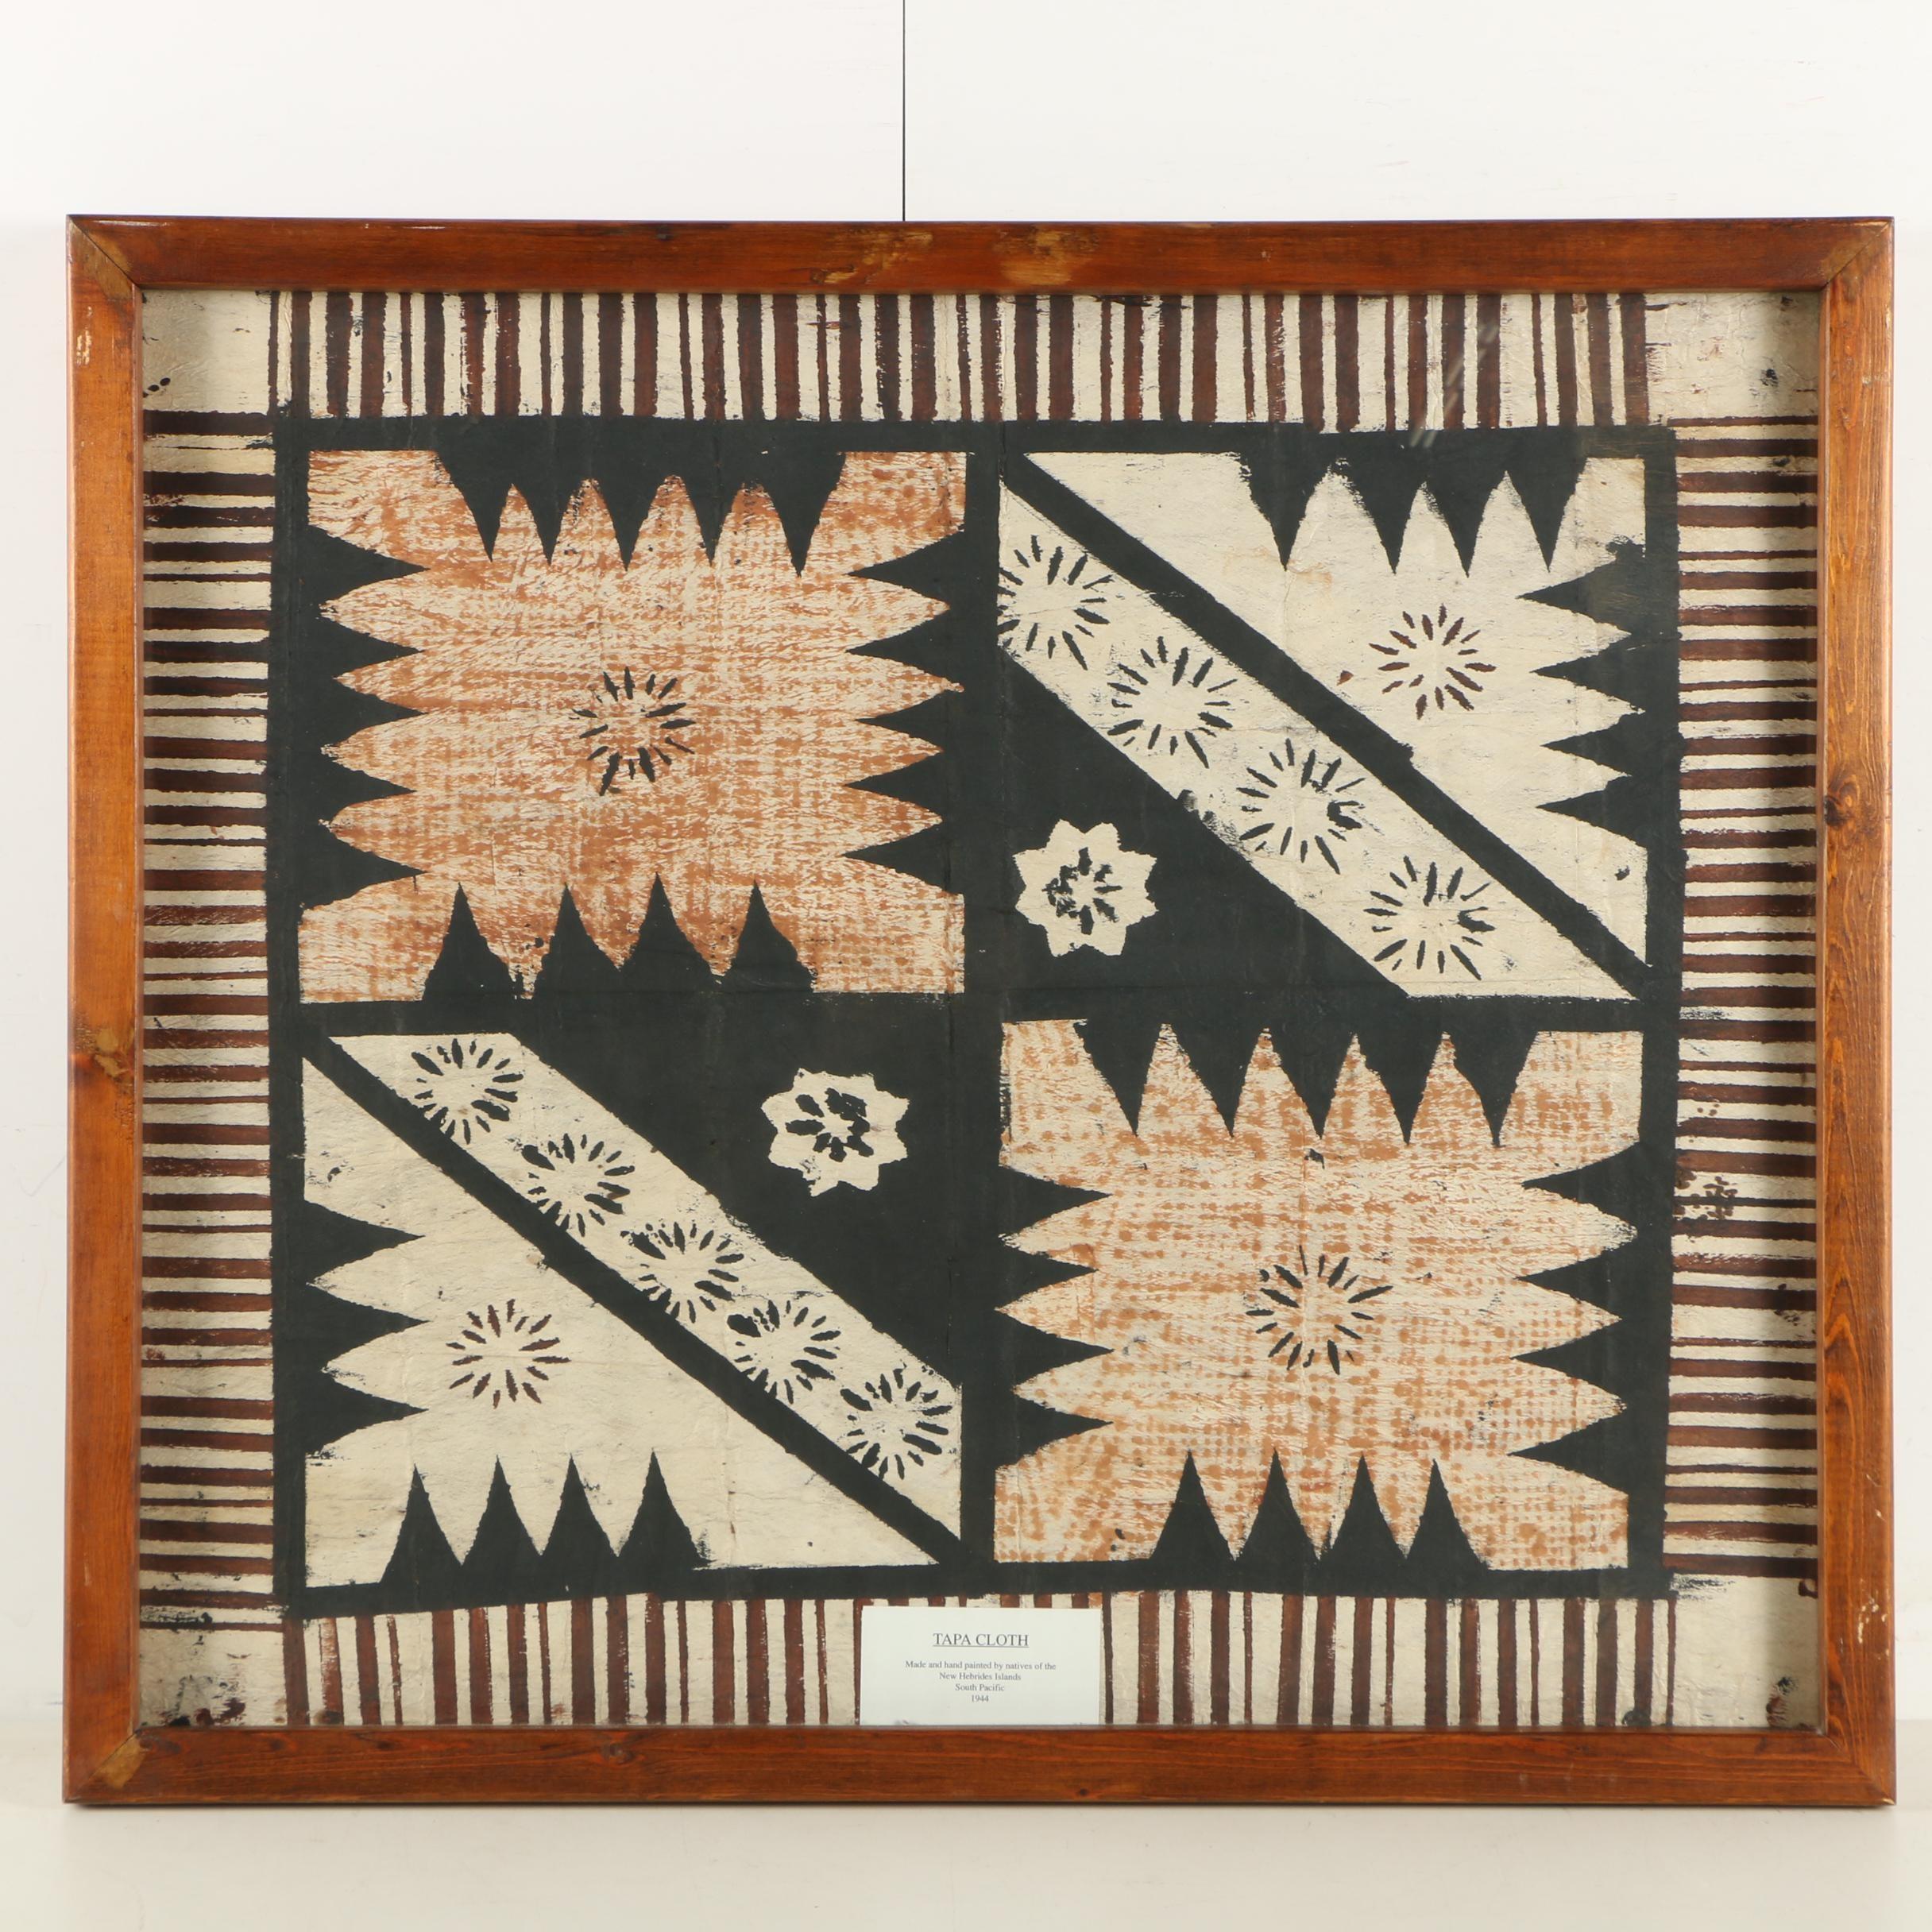 1944 Hand Painted Tapa Cloth